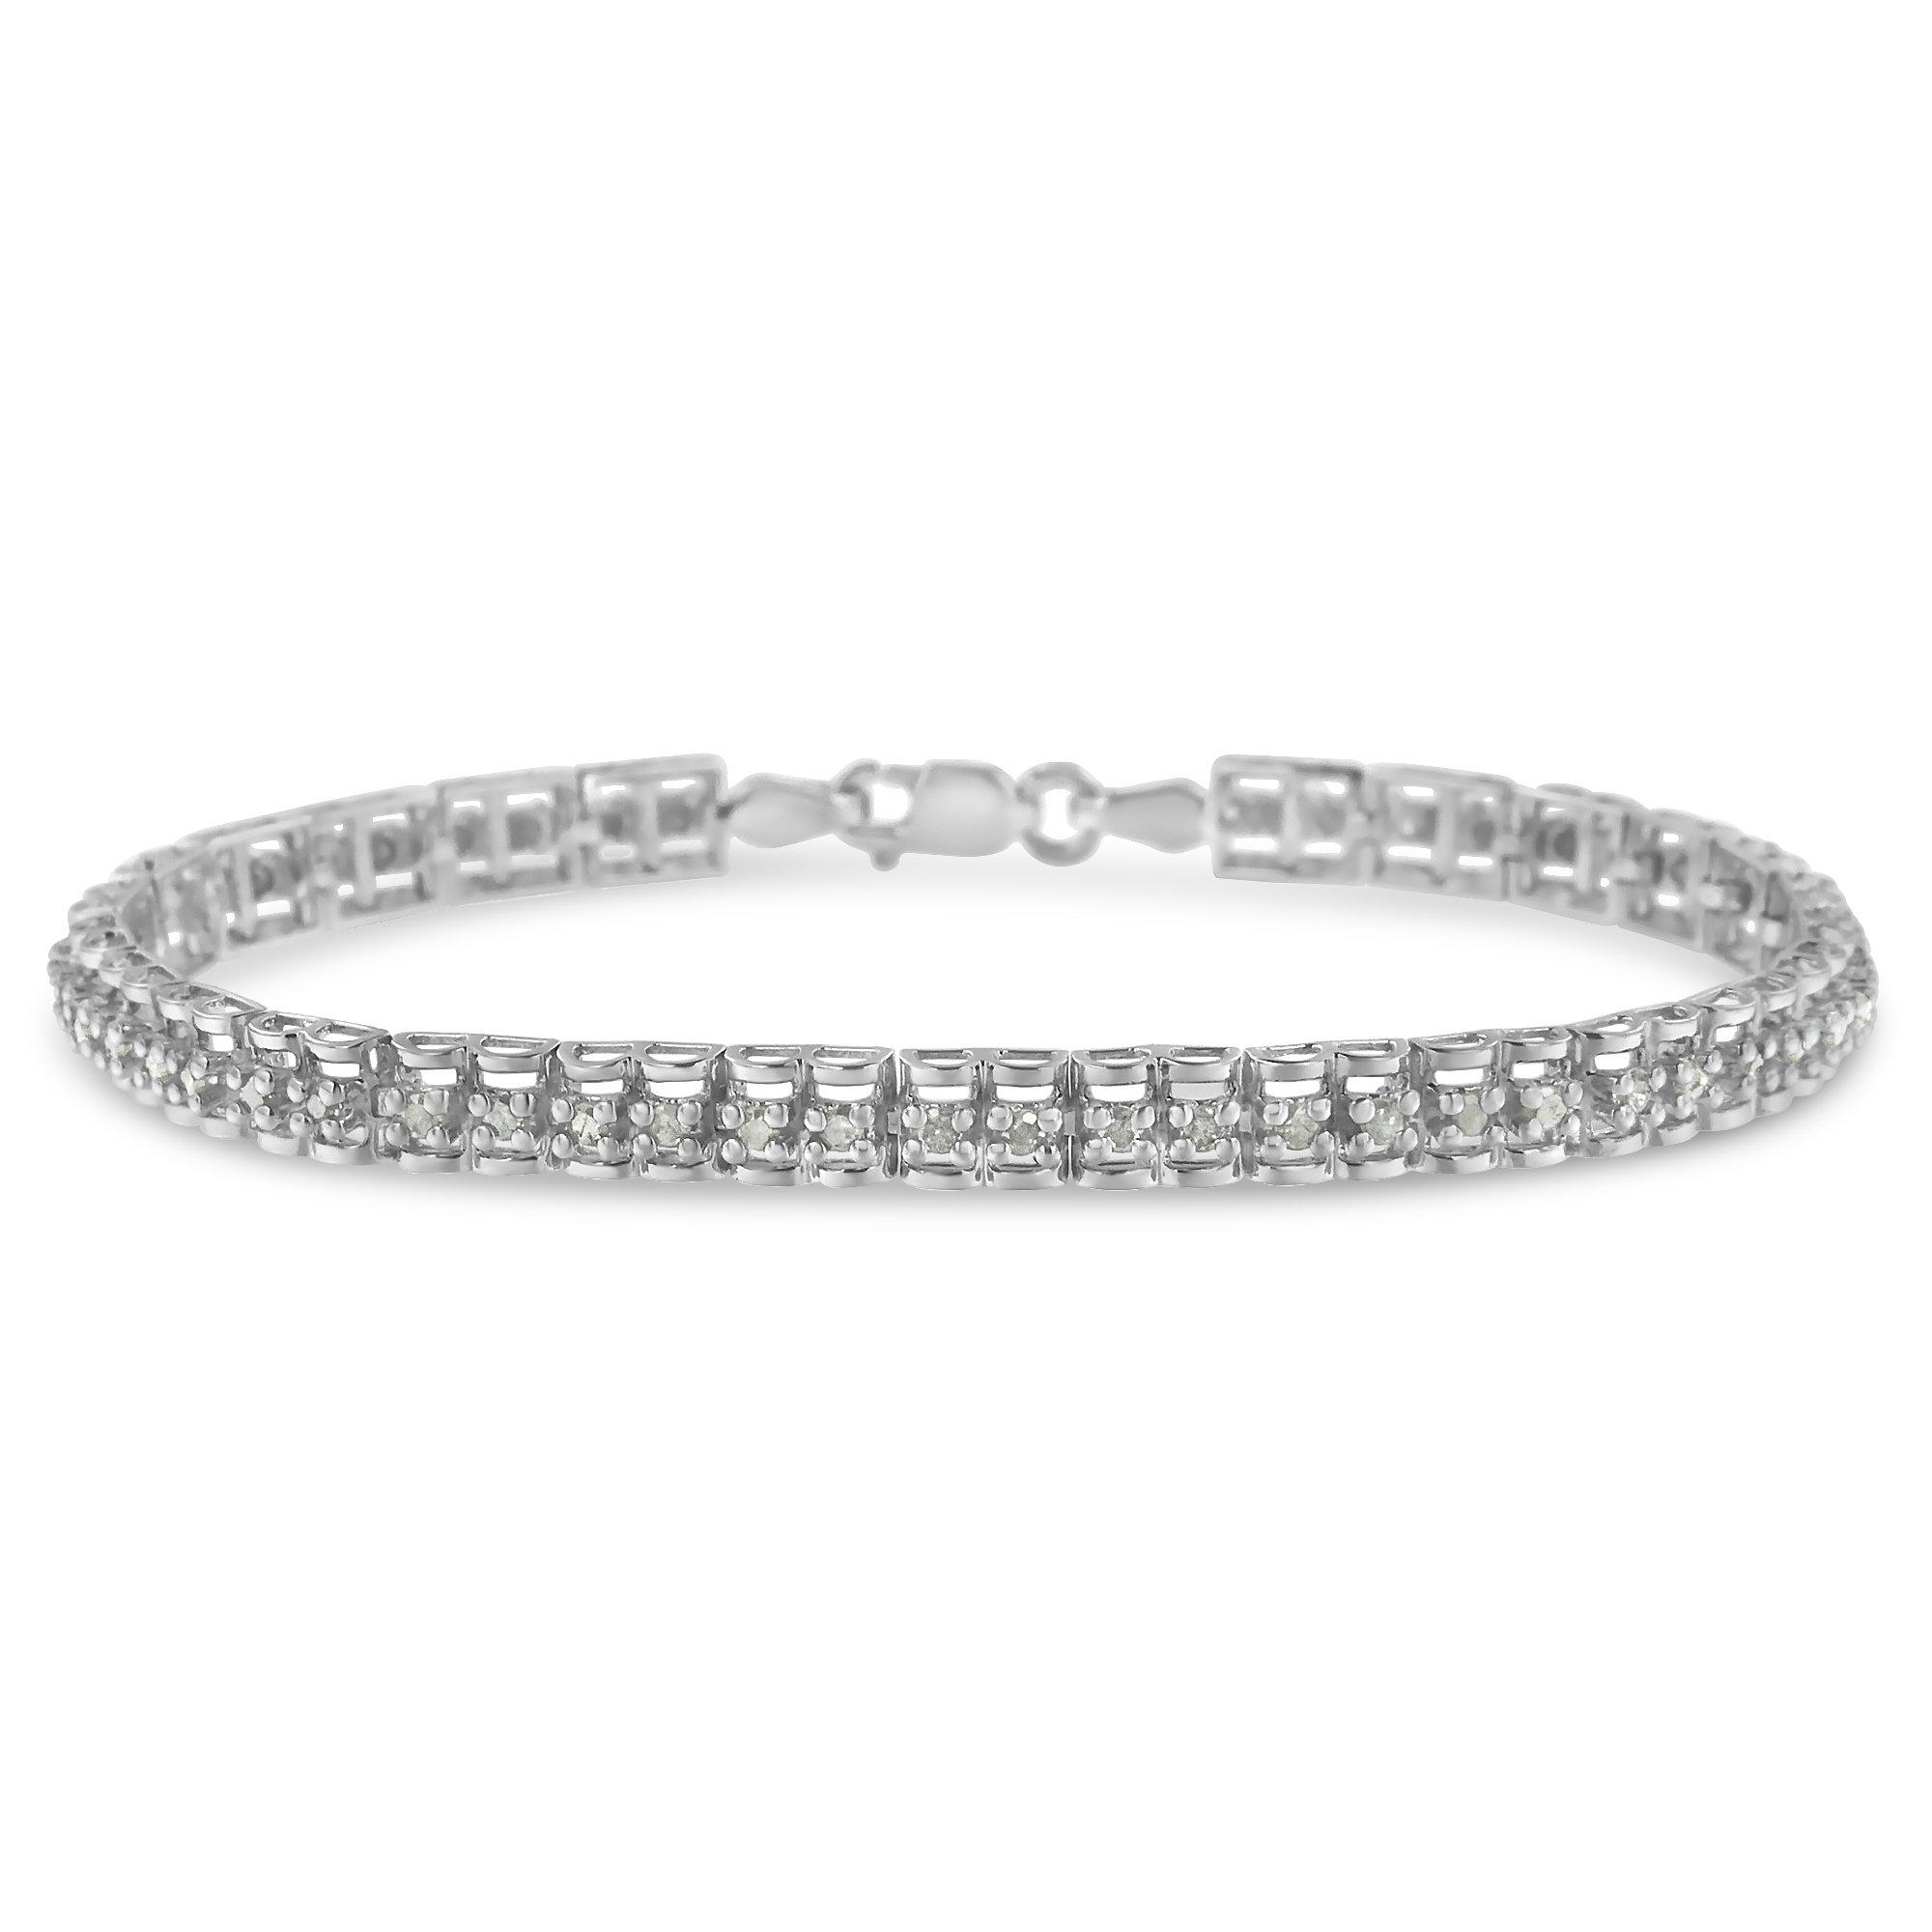 Sterling Silver Rose-cut Diamond Tennis Bracelet (1.00 cttw, I-J Color, I3 Clarity)